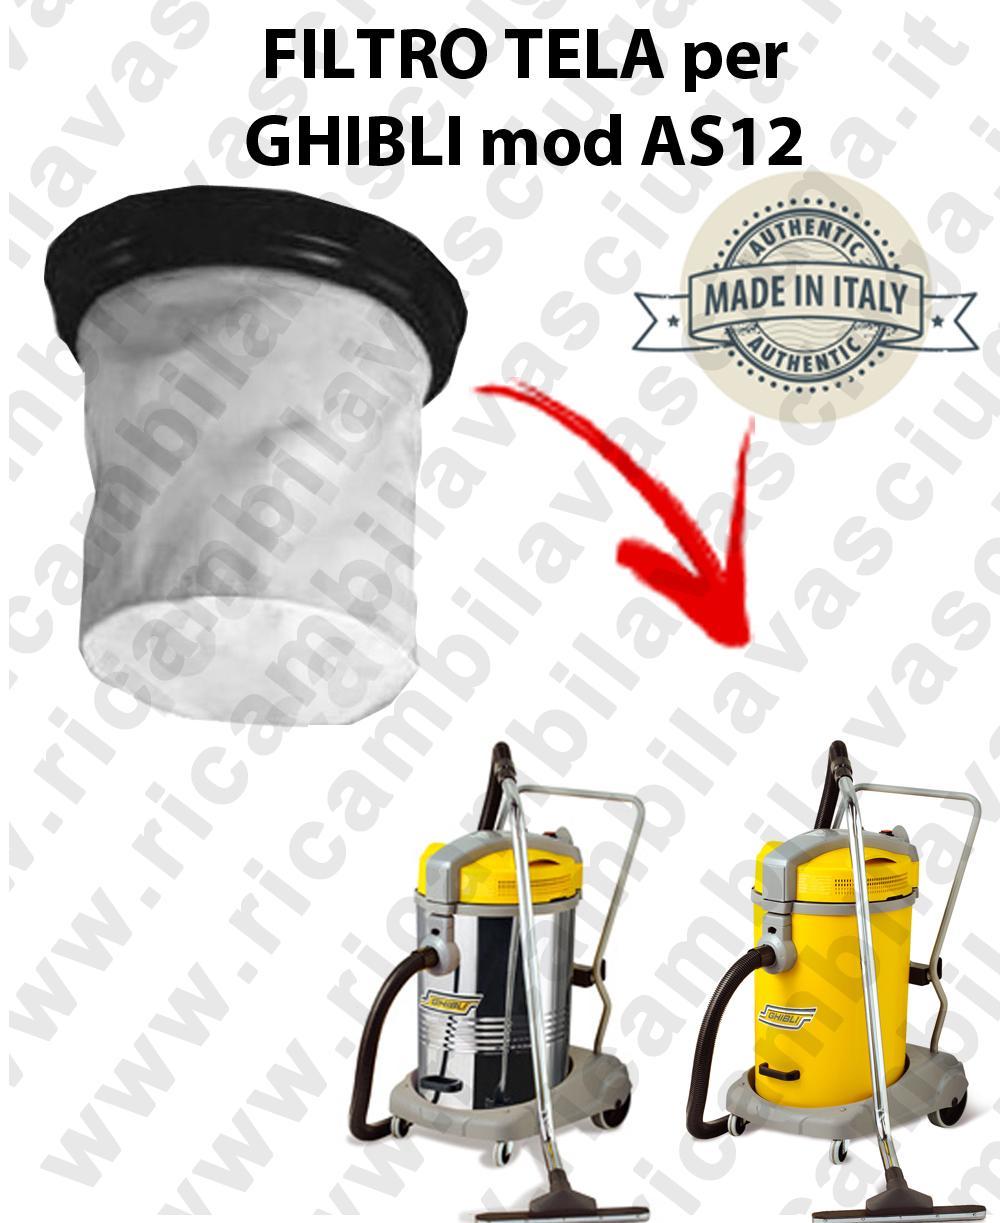 Filtro de tela para aspiradora GHIBLI Model AS 12